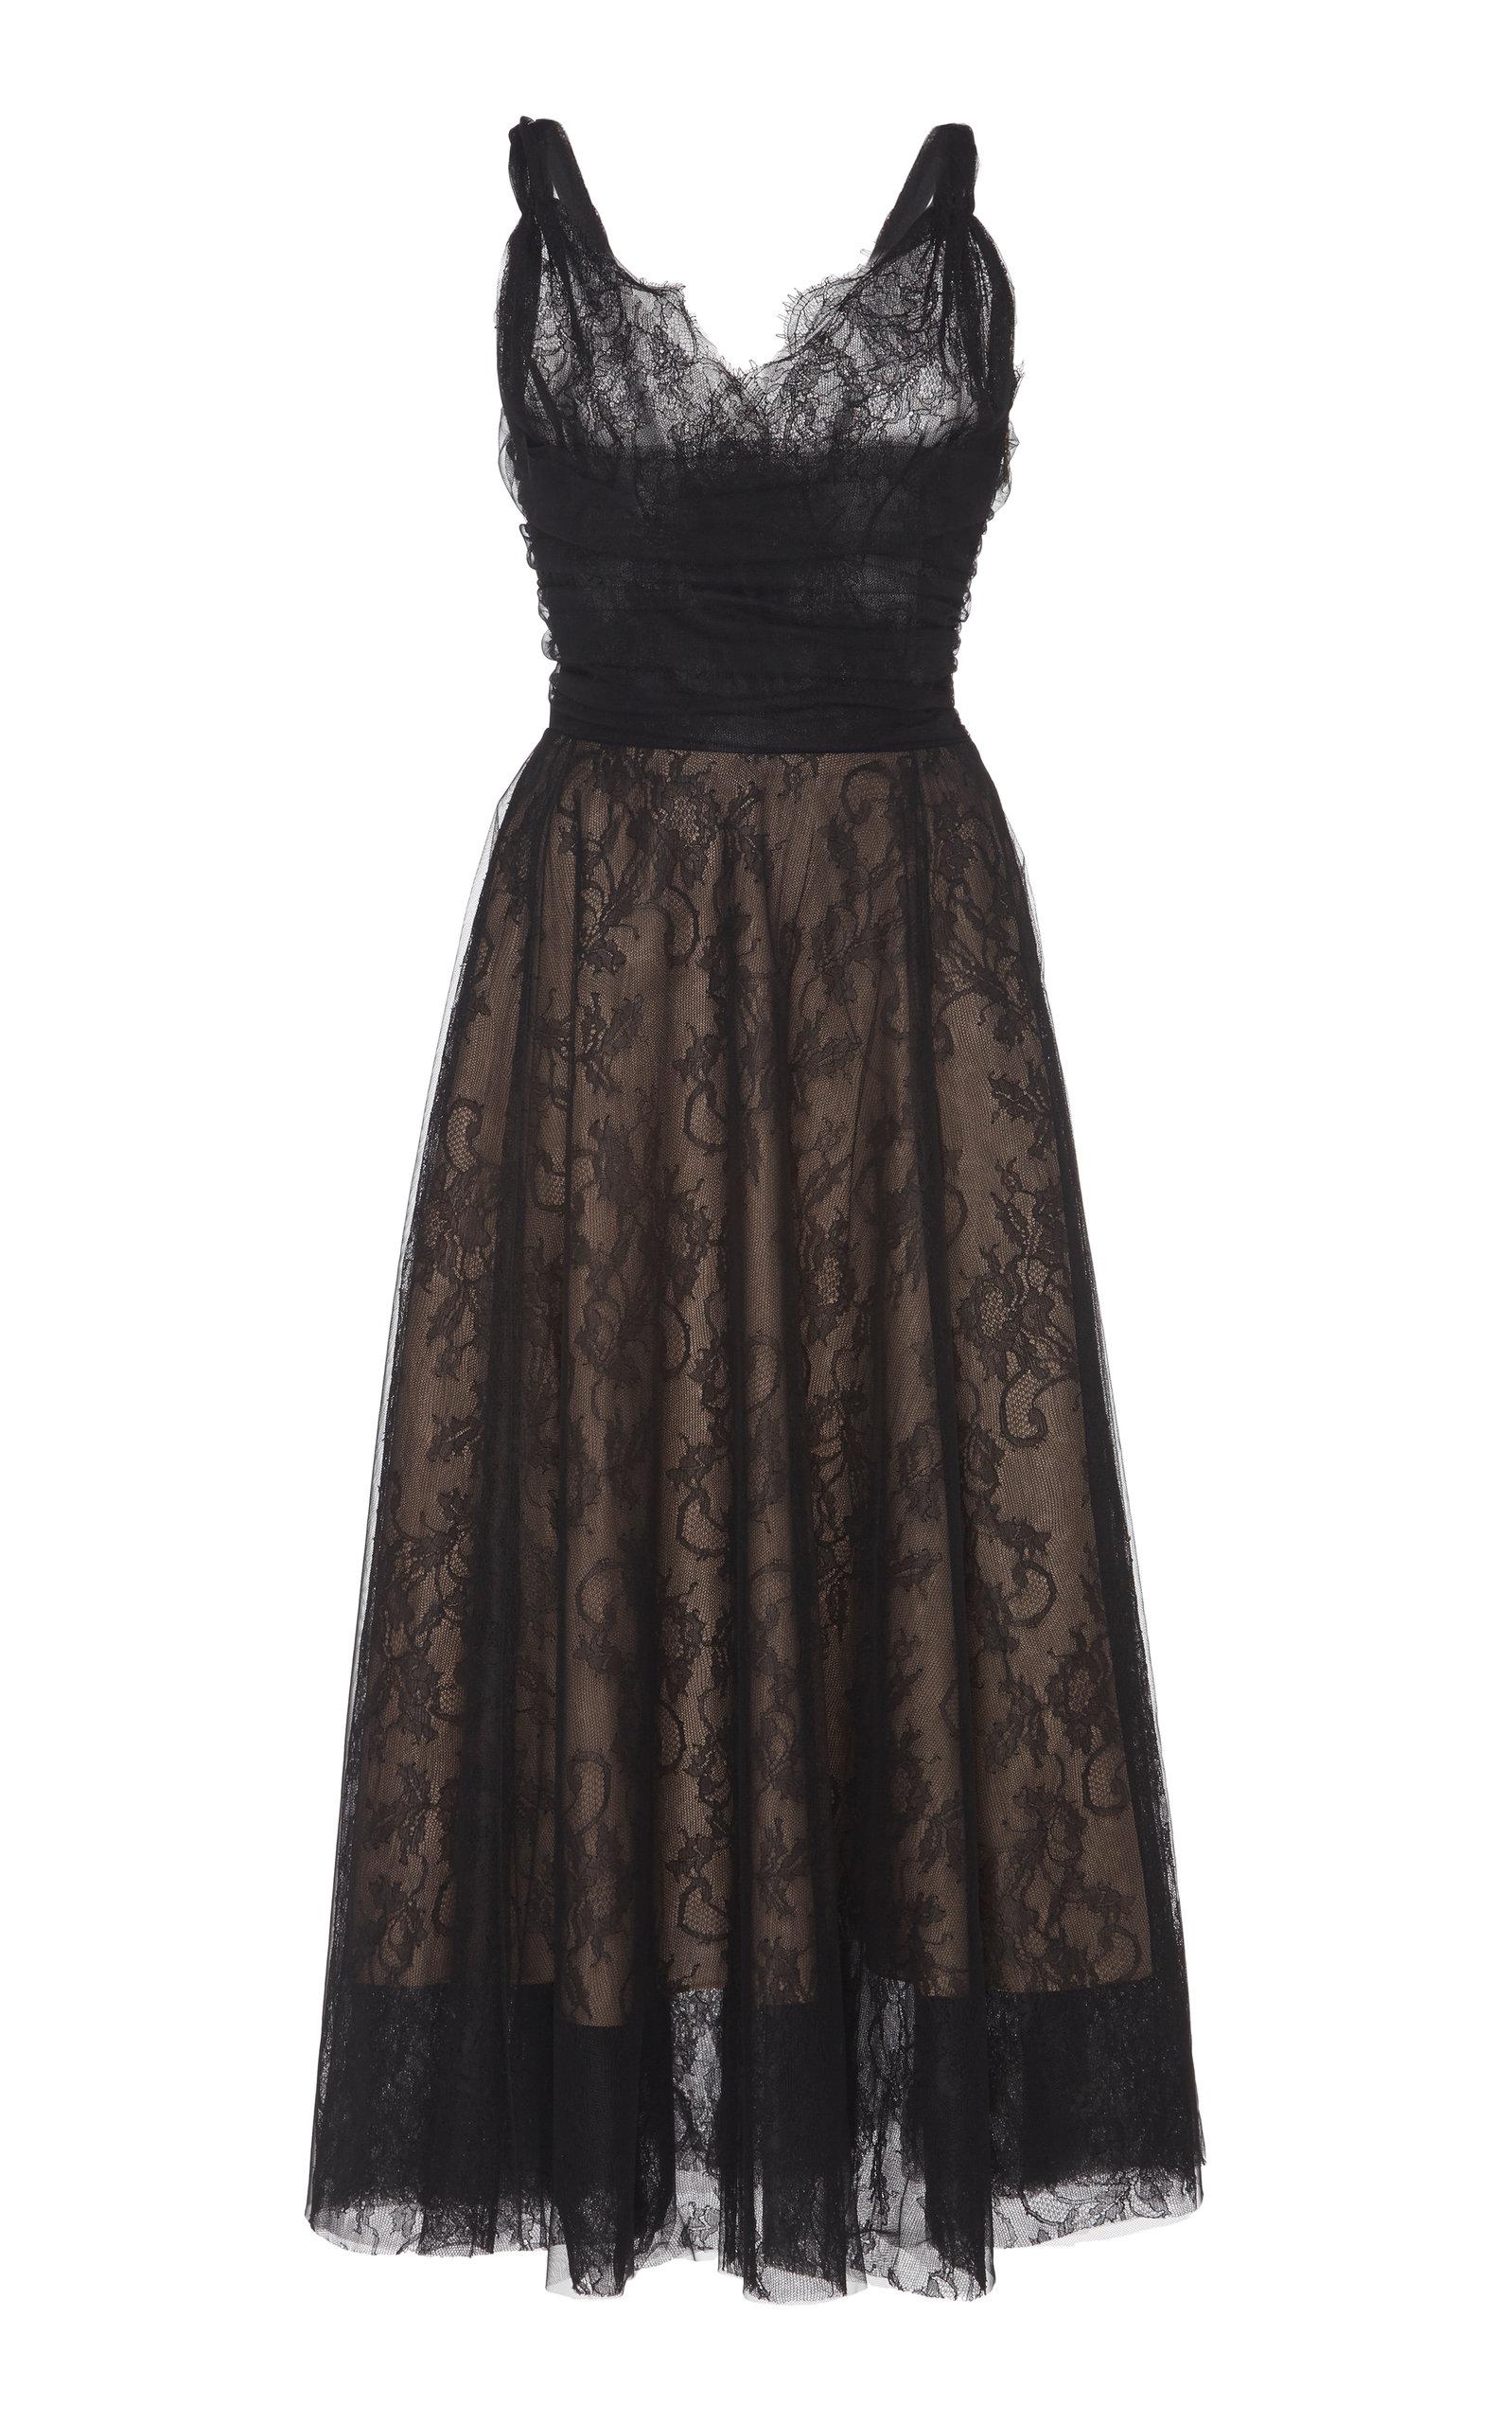 Rochas   Rochas Chantilly Lace MidI Dress   Clouty